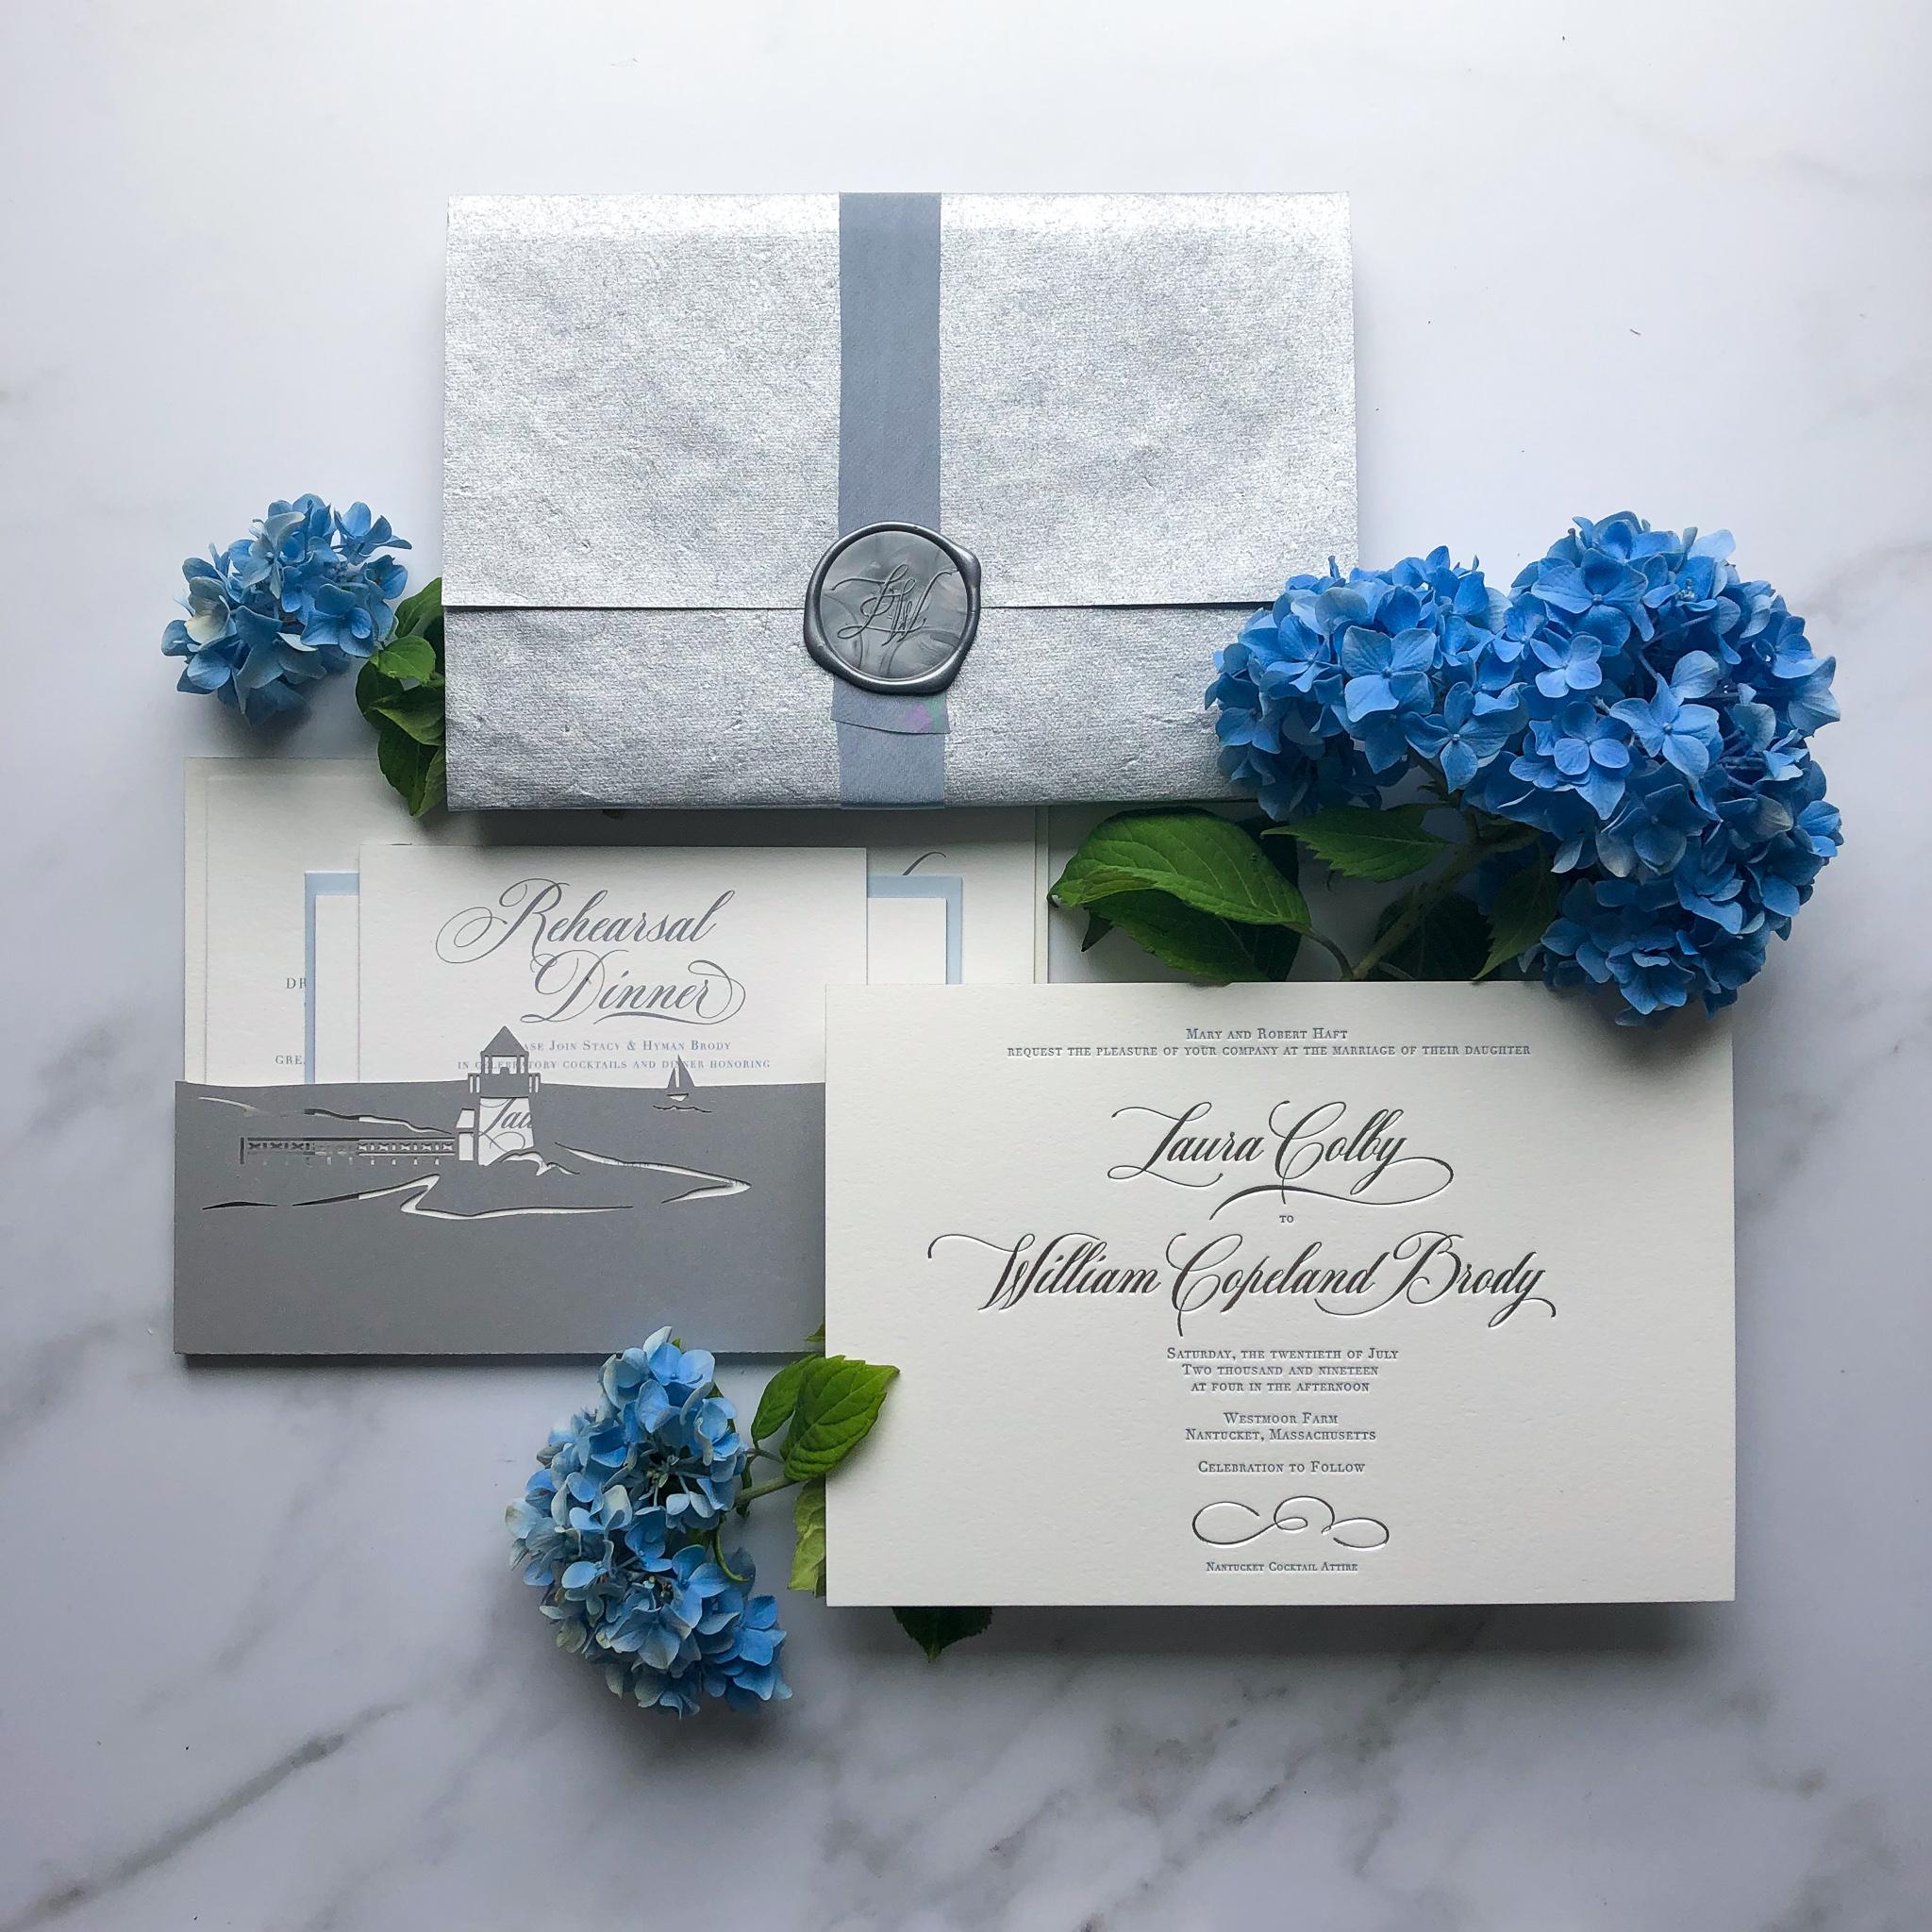 TypeAInvitations_Nantucket_SilverBlue_Wedding_FormalInvitation_SilverFoilStamping_LaserCutPocketBacking_Hydrangeas.jpg